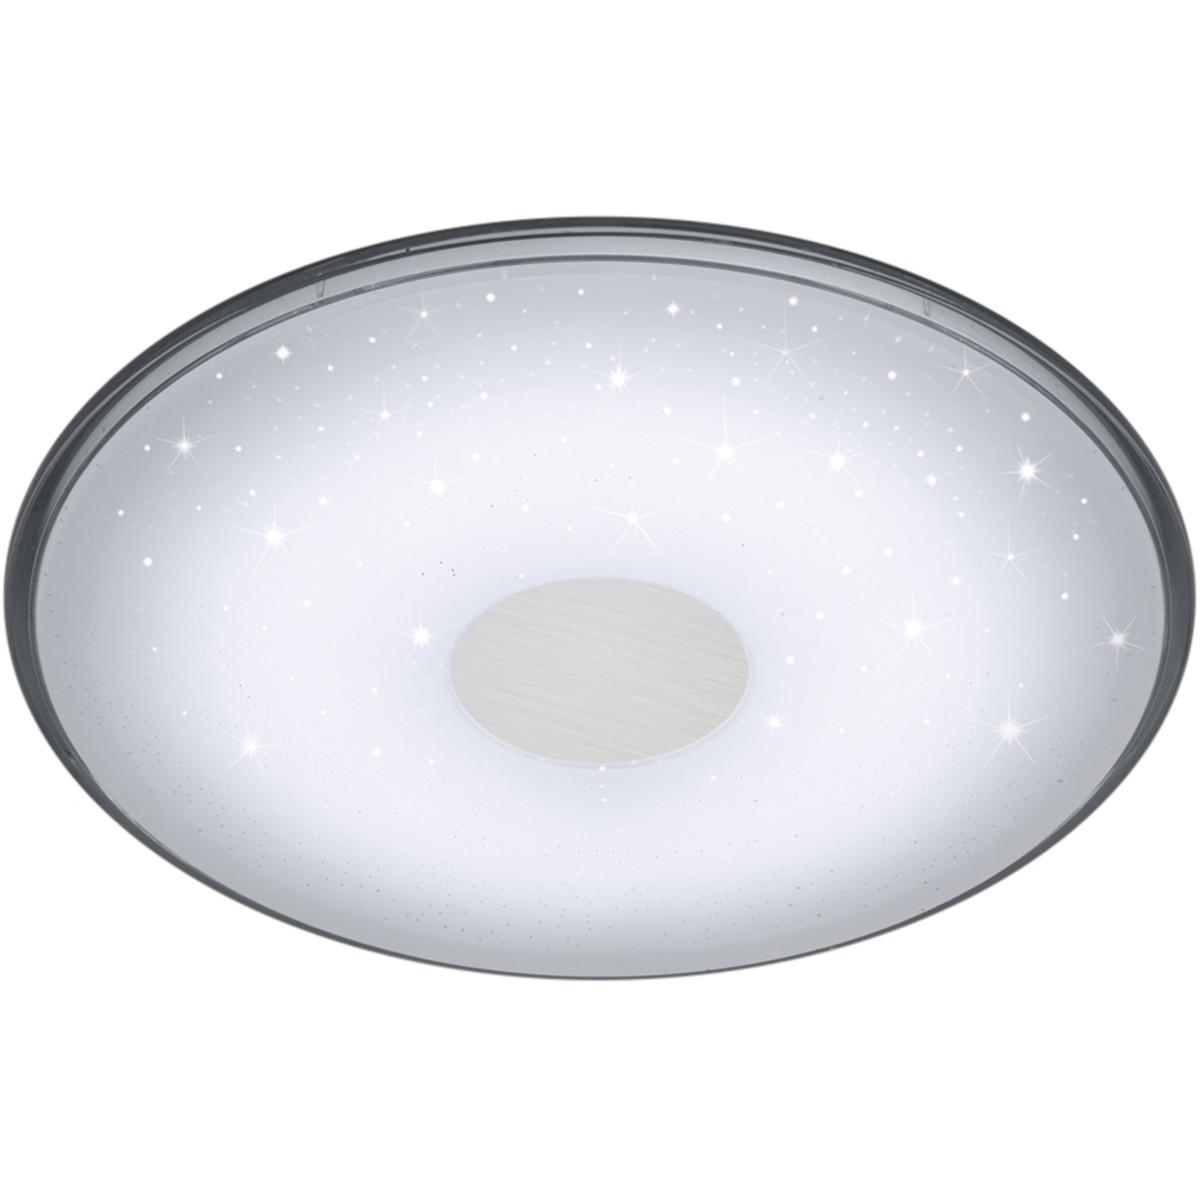 LED Plafondlamp - Trion Sorgina - 30W - Aanpasbare Kleur - Dimbaar - Afstandsbediening - Rond - Mat